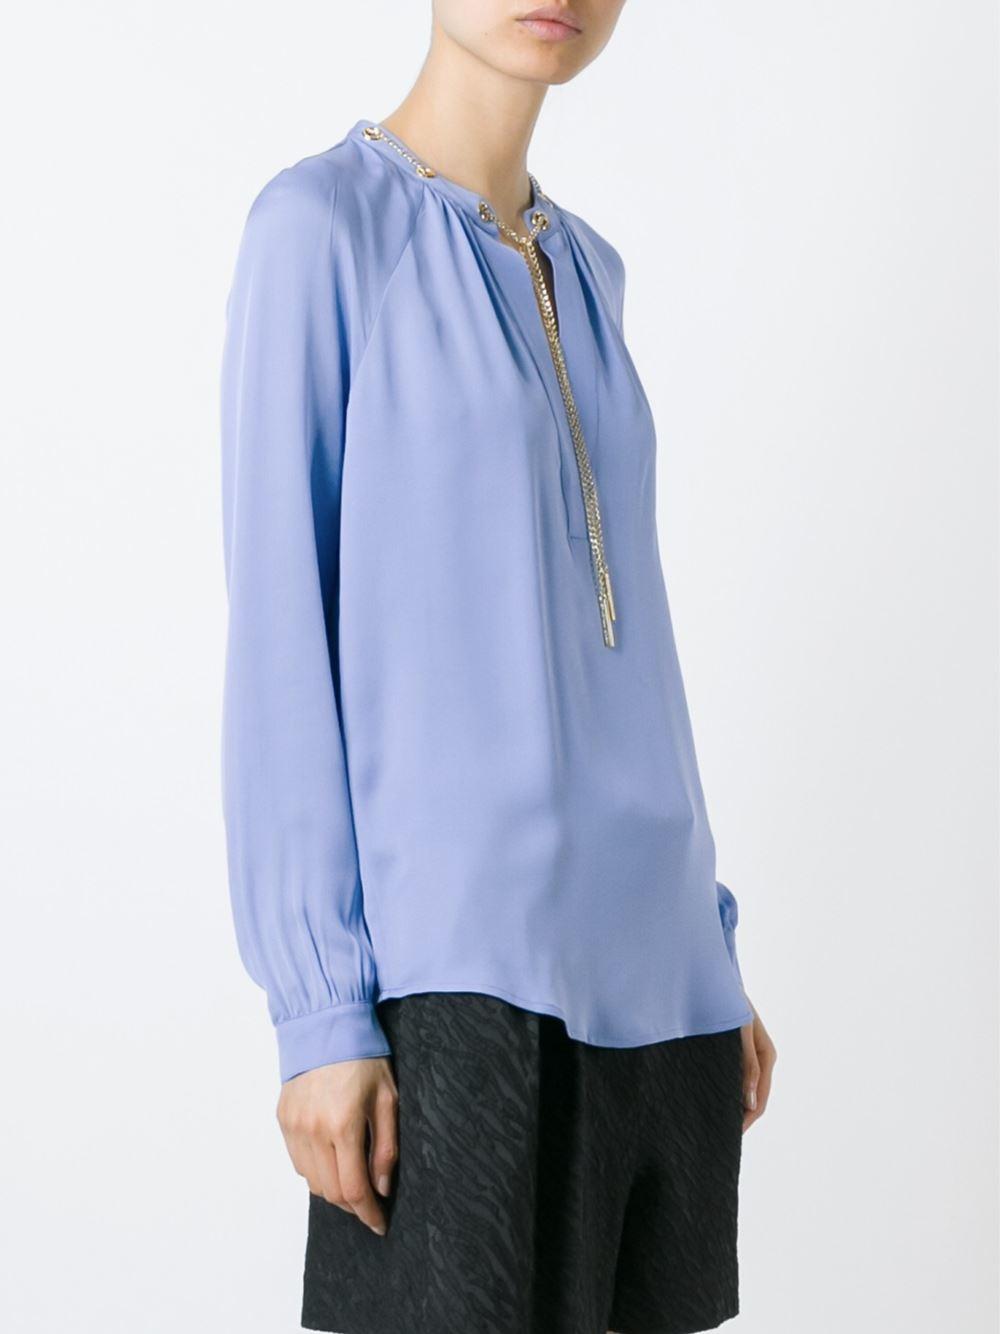 michael michael kors band collar blouse in blue lyst. Black Bedroom Furniture Sets. Home Design Ideas